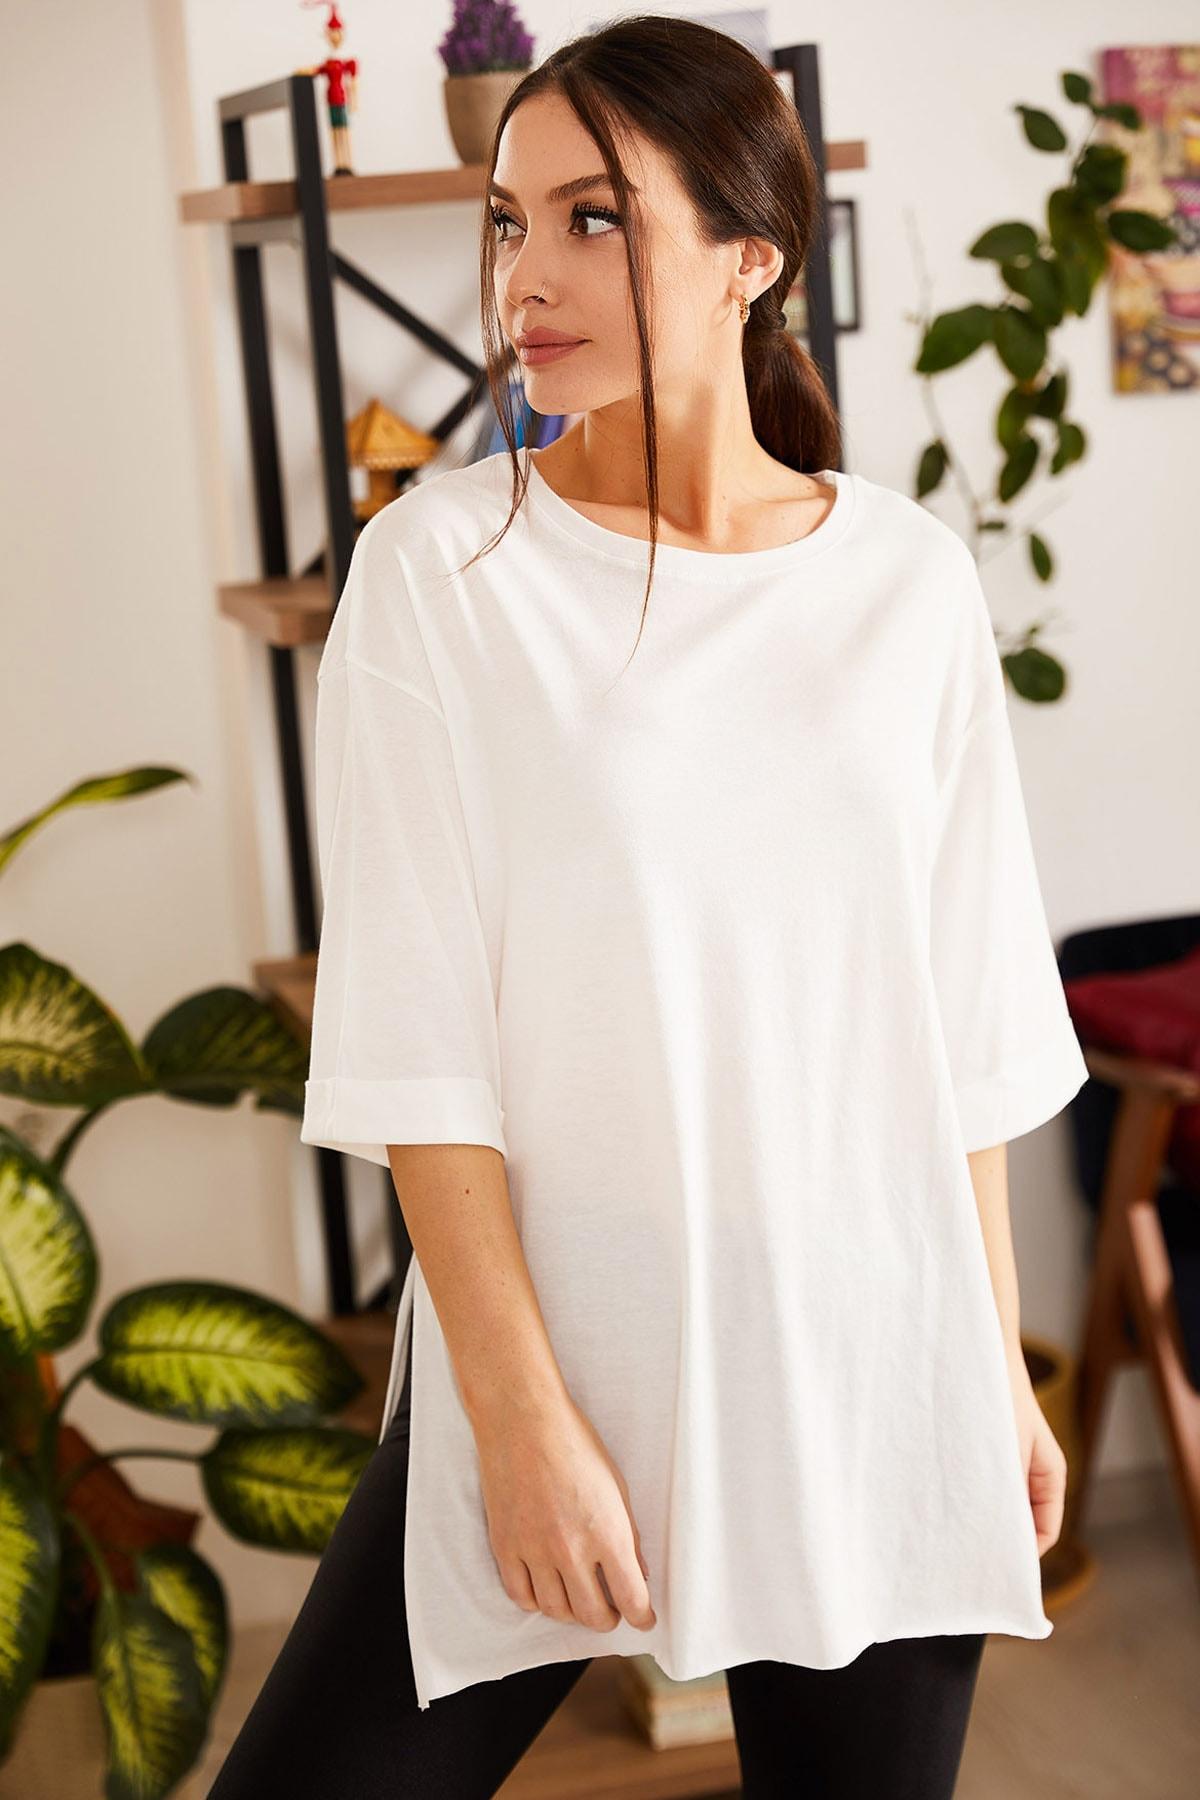 armonika Kadın Ekru Yuvarlak Yaka Geniş Kollu Yanı Yırtmaçlı T-Shirt ARM-19Y012003 1